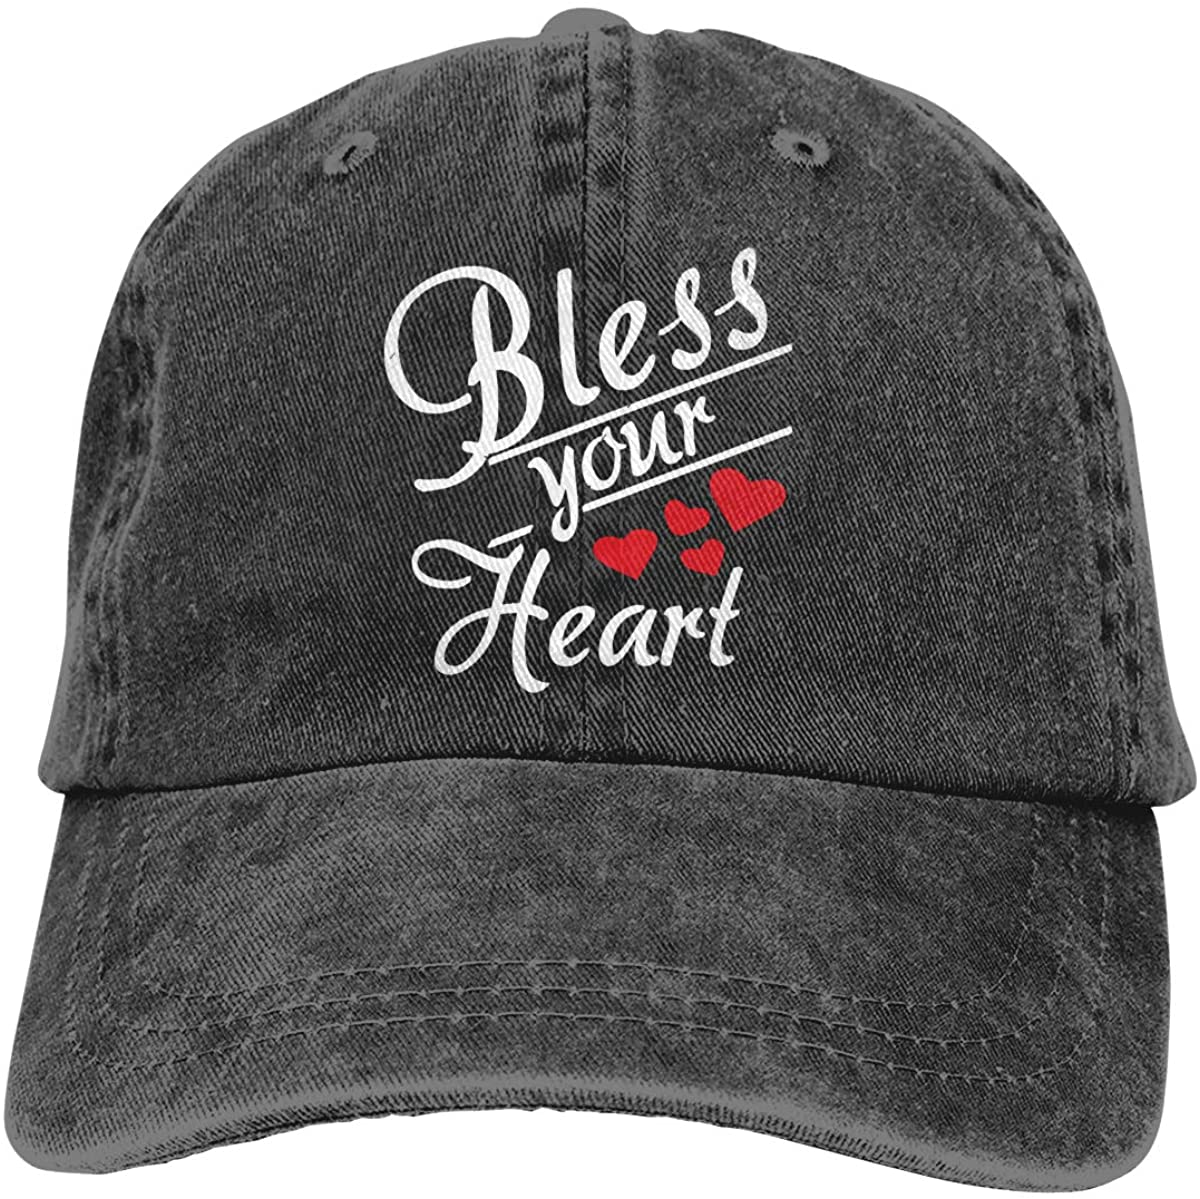 PTNHINAMO Bless Your Heart Unisex Fashion Cool Adult Adjustable Denim Cowboy Hat